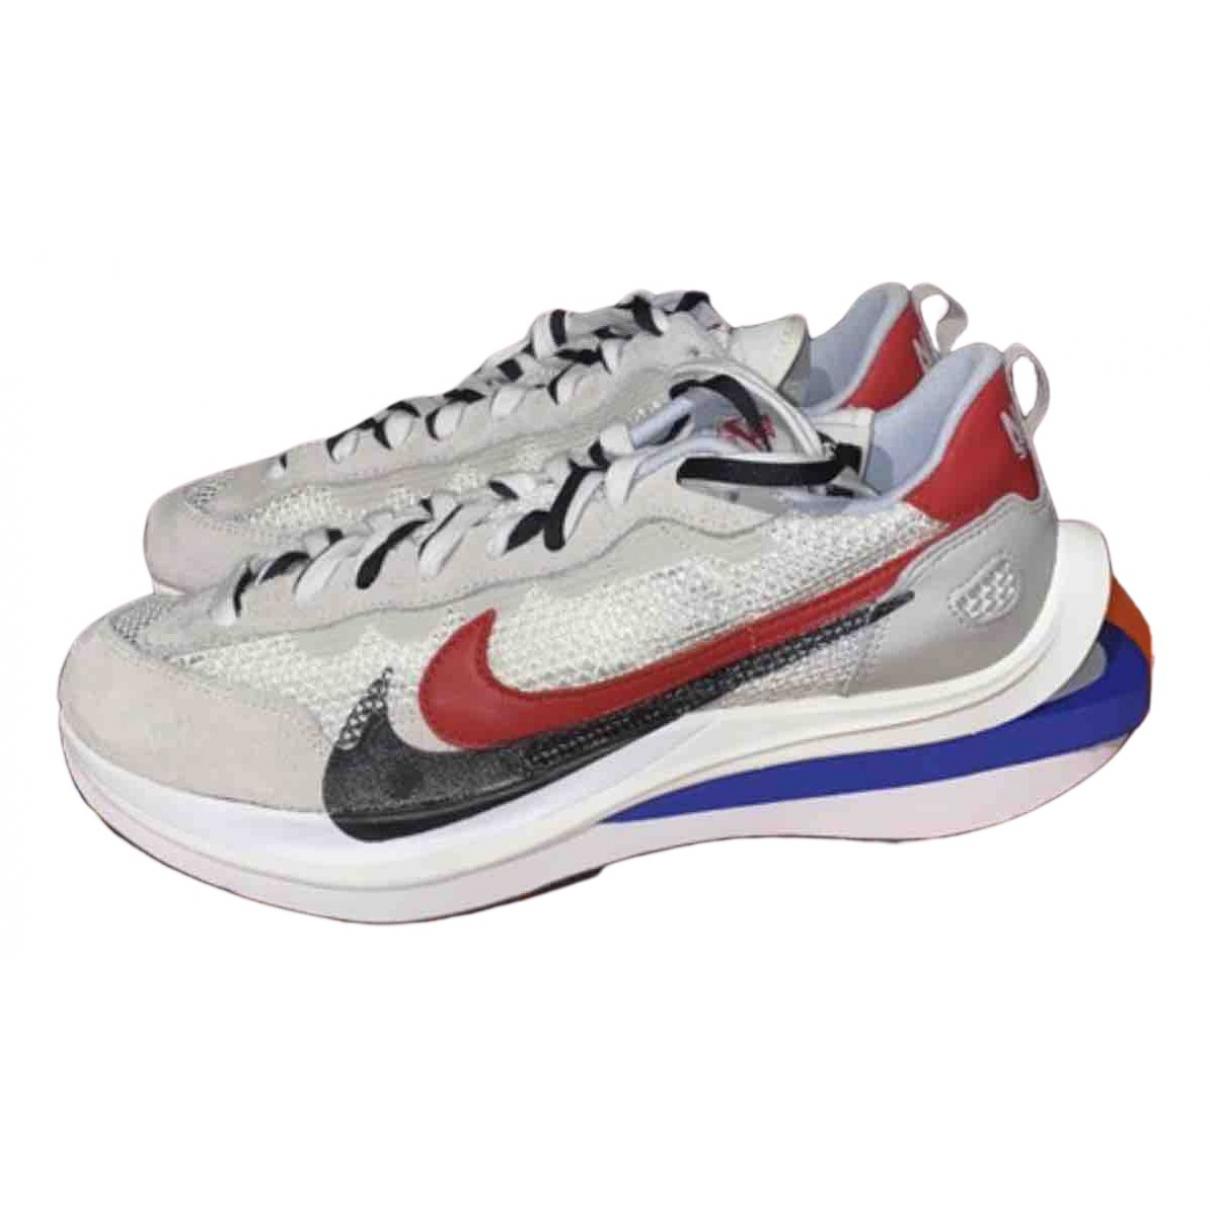 Nike X Sacai - Baskets Vaporwaffle pour homme en toile - blanc